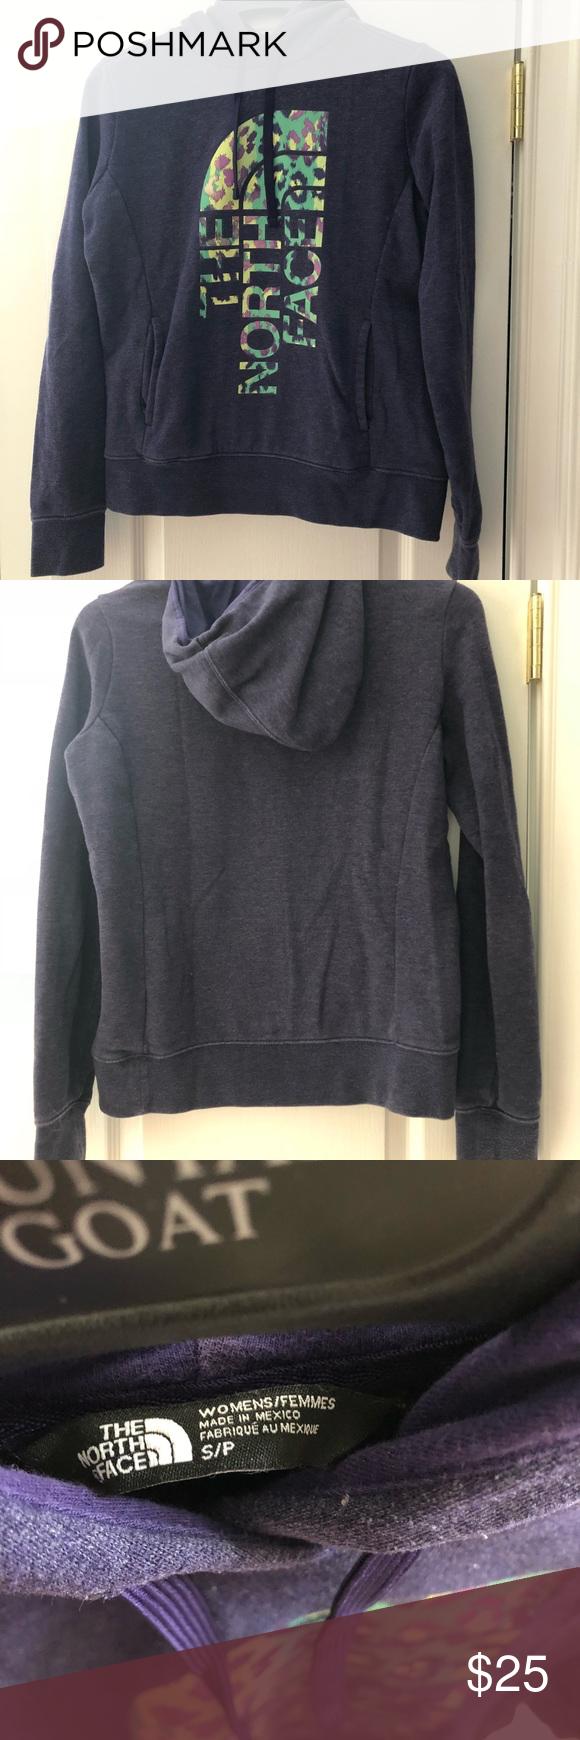 896267203 ⚡️flash sale⚡️The North Face TNF Purple Sweatshirt The North ...